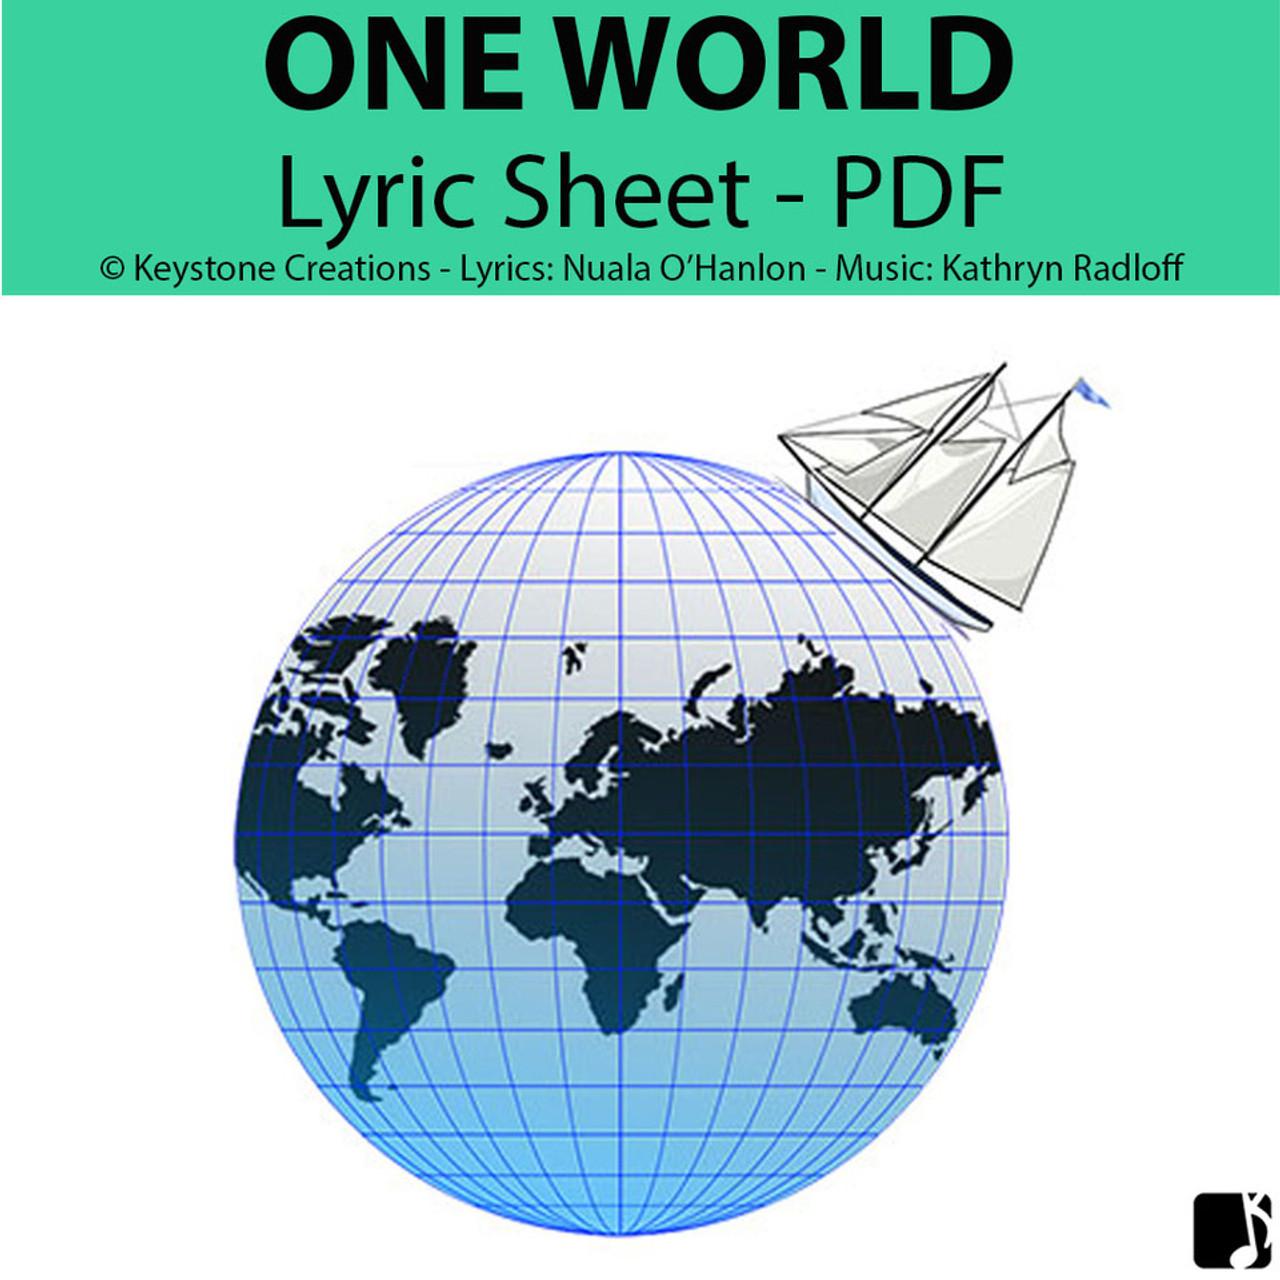 'ONE WORLD' (Grades K-12) ~ Lyric Sheet PDF: FREE (limited Time)